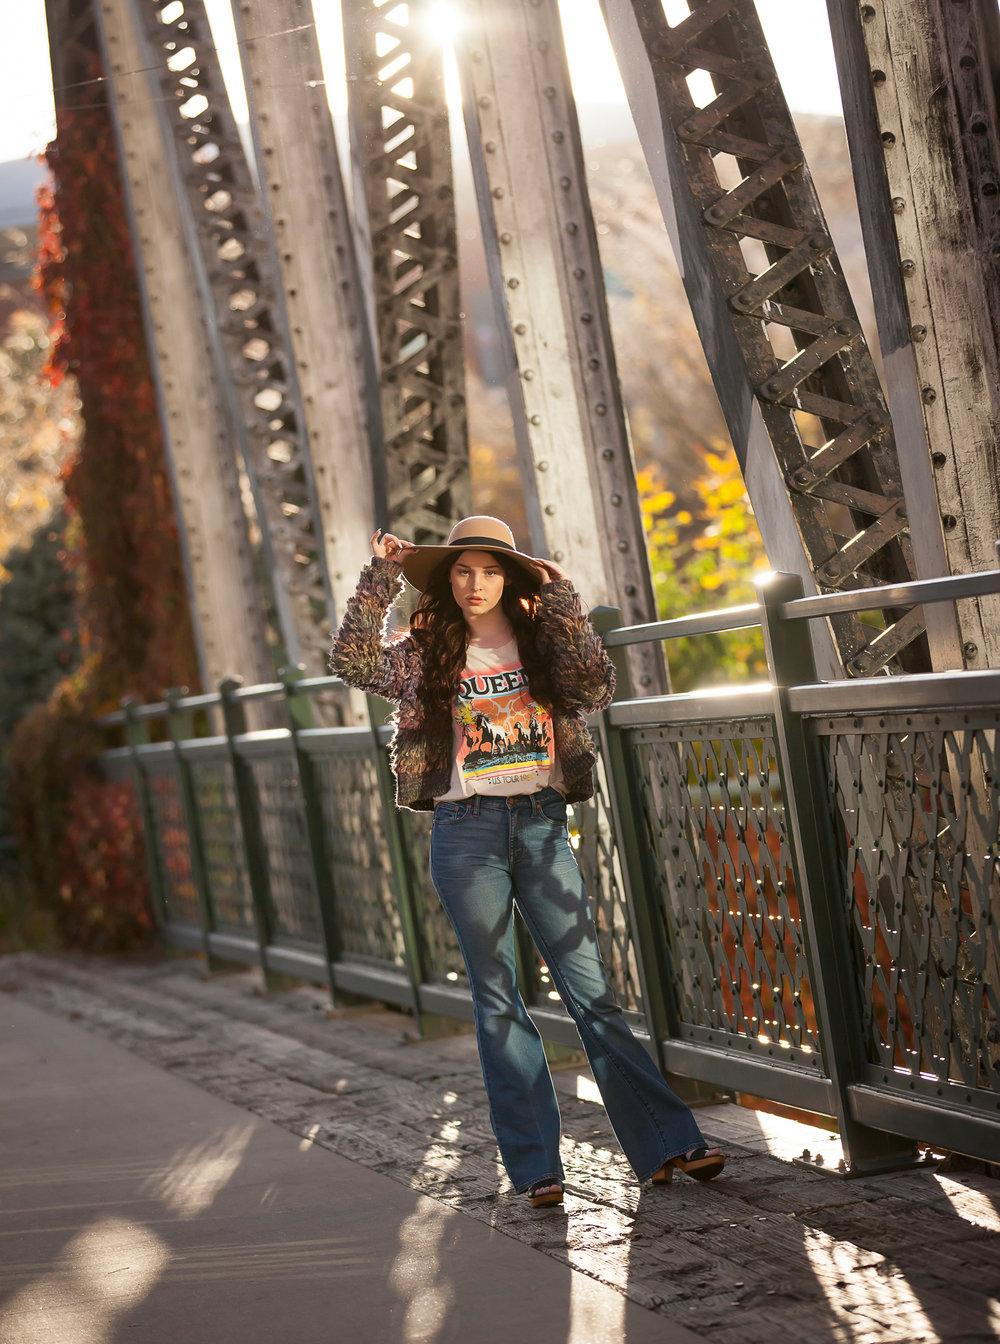 Senior Pictures in Denver with photographer Jennifer Koskinen